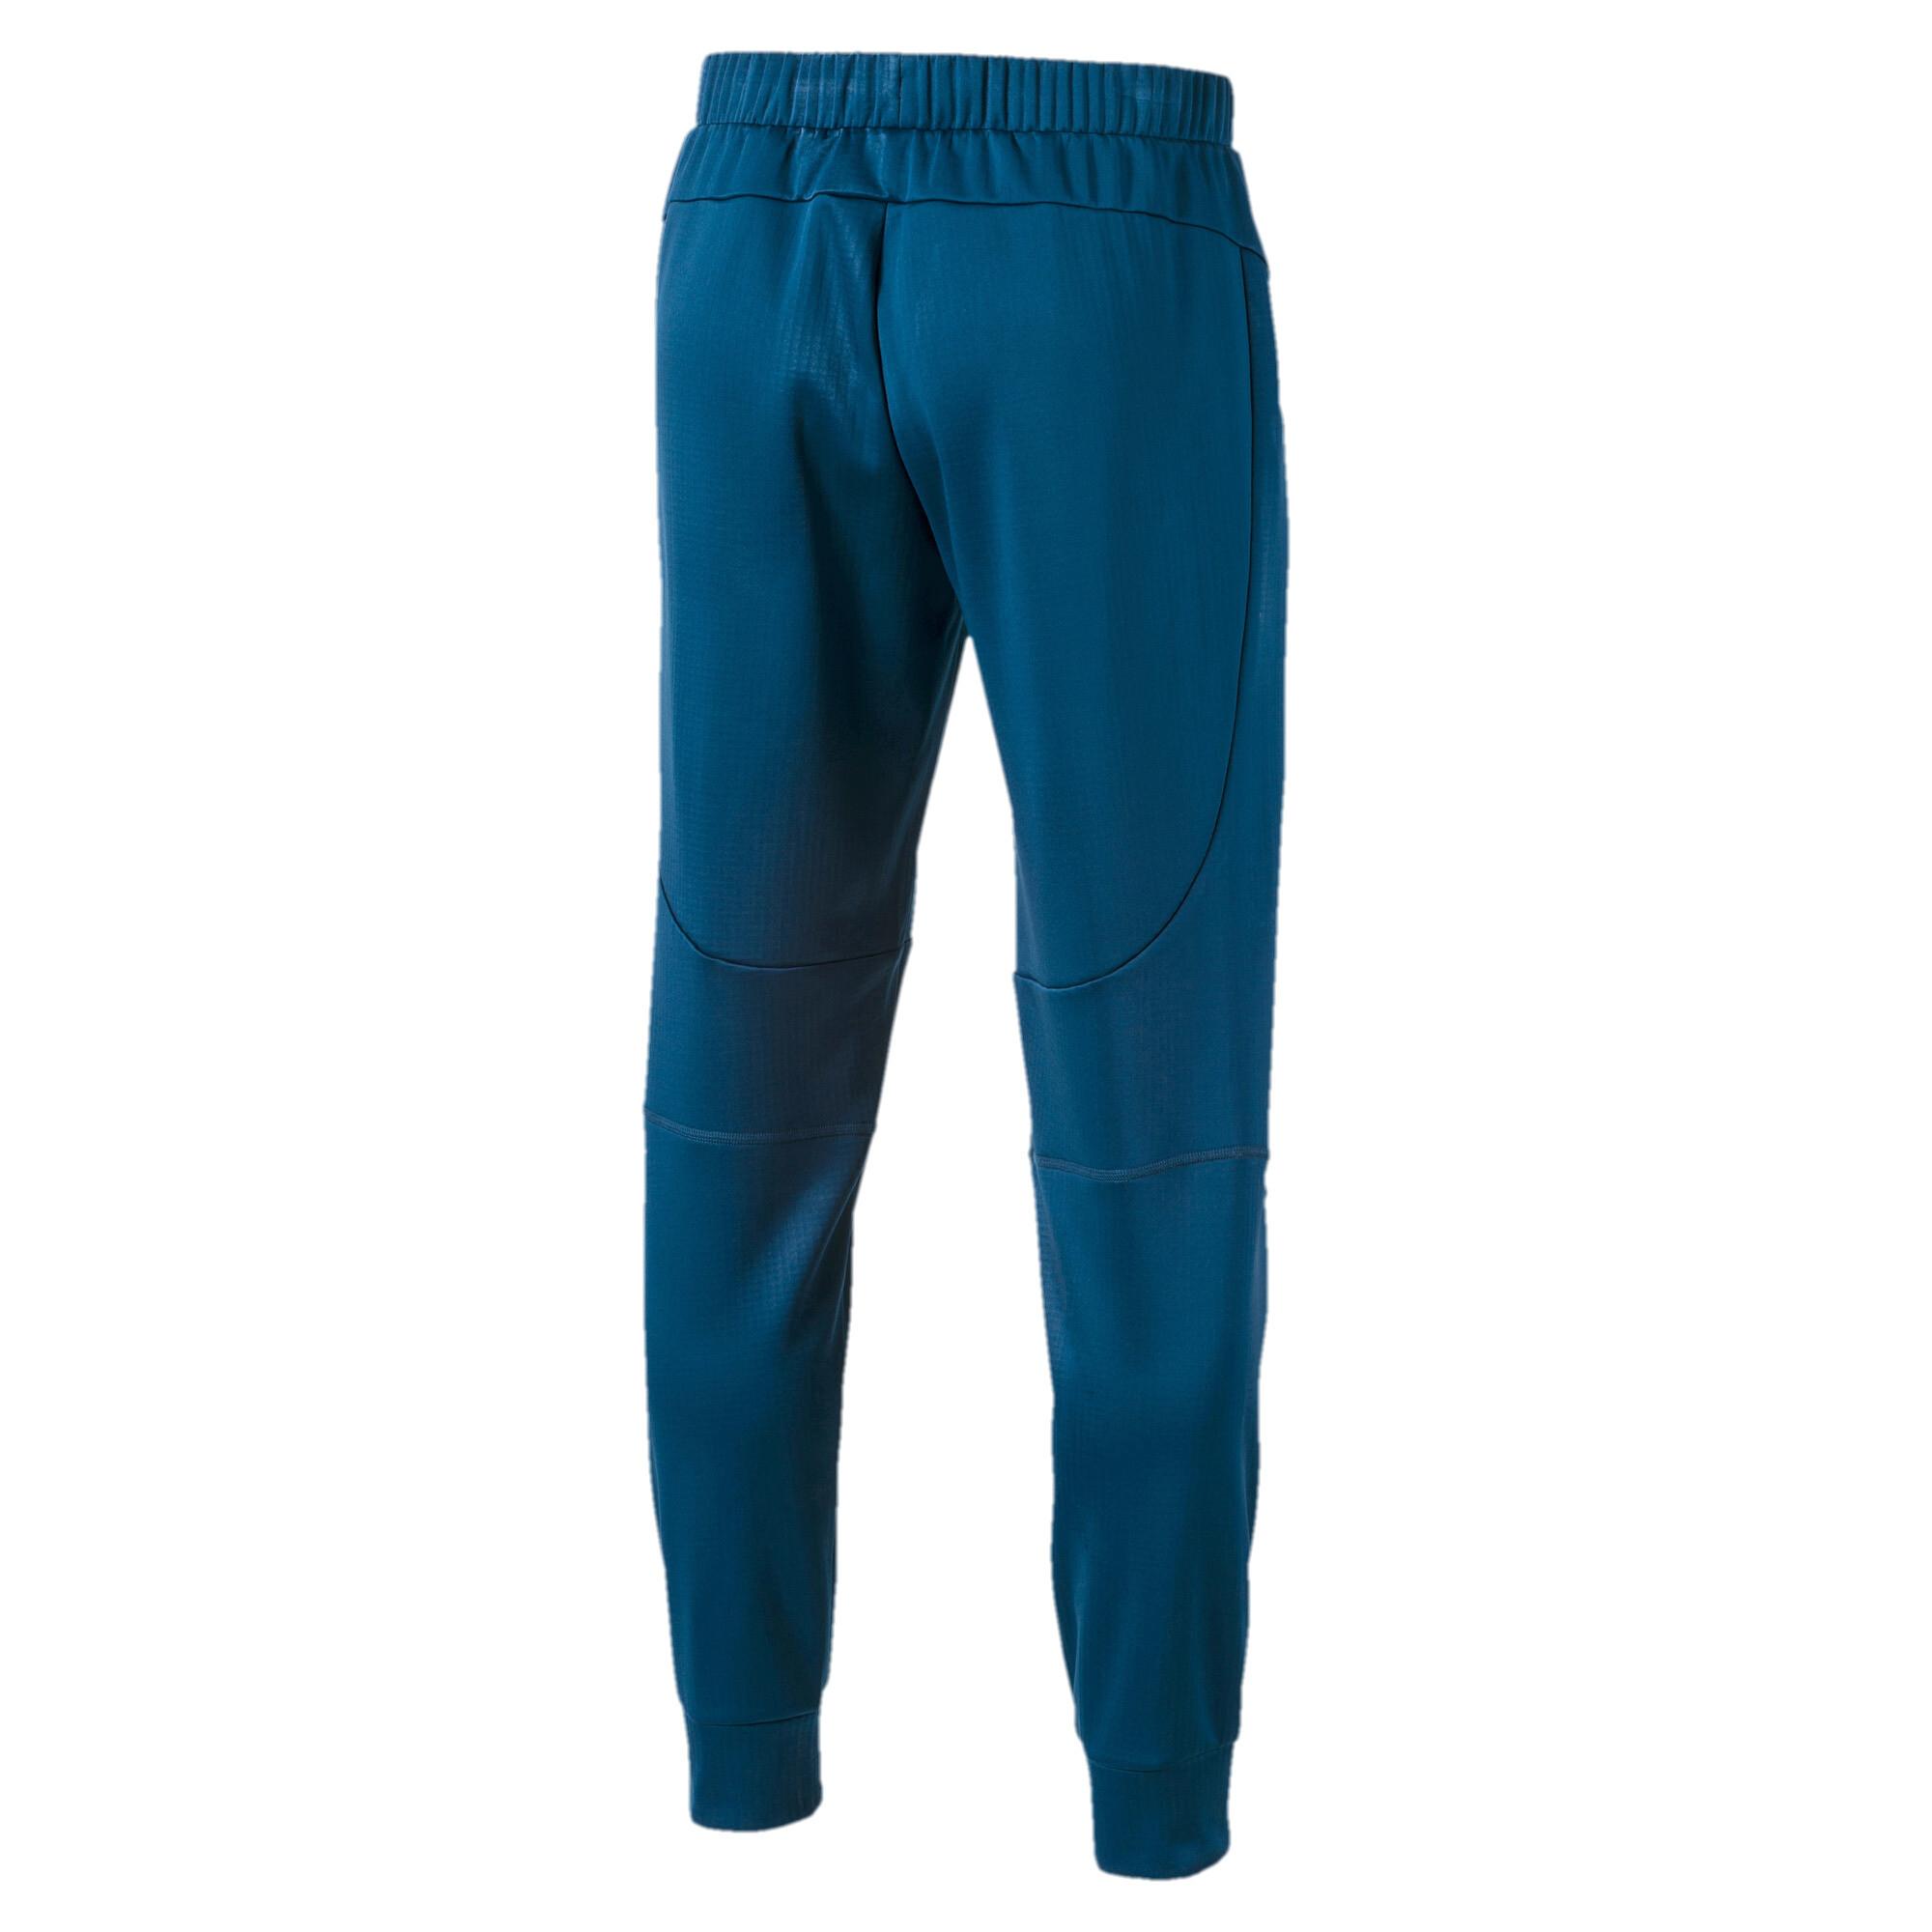 PUMA-Evostripe-Warm-Men-039-s-Pants-Men-Knitted-Pants-Basics miniatura 13